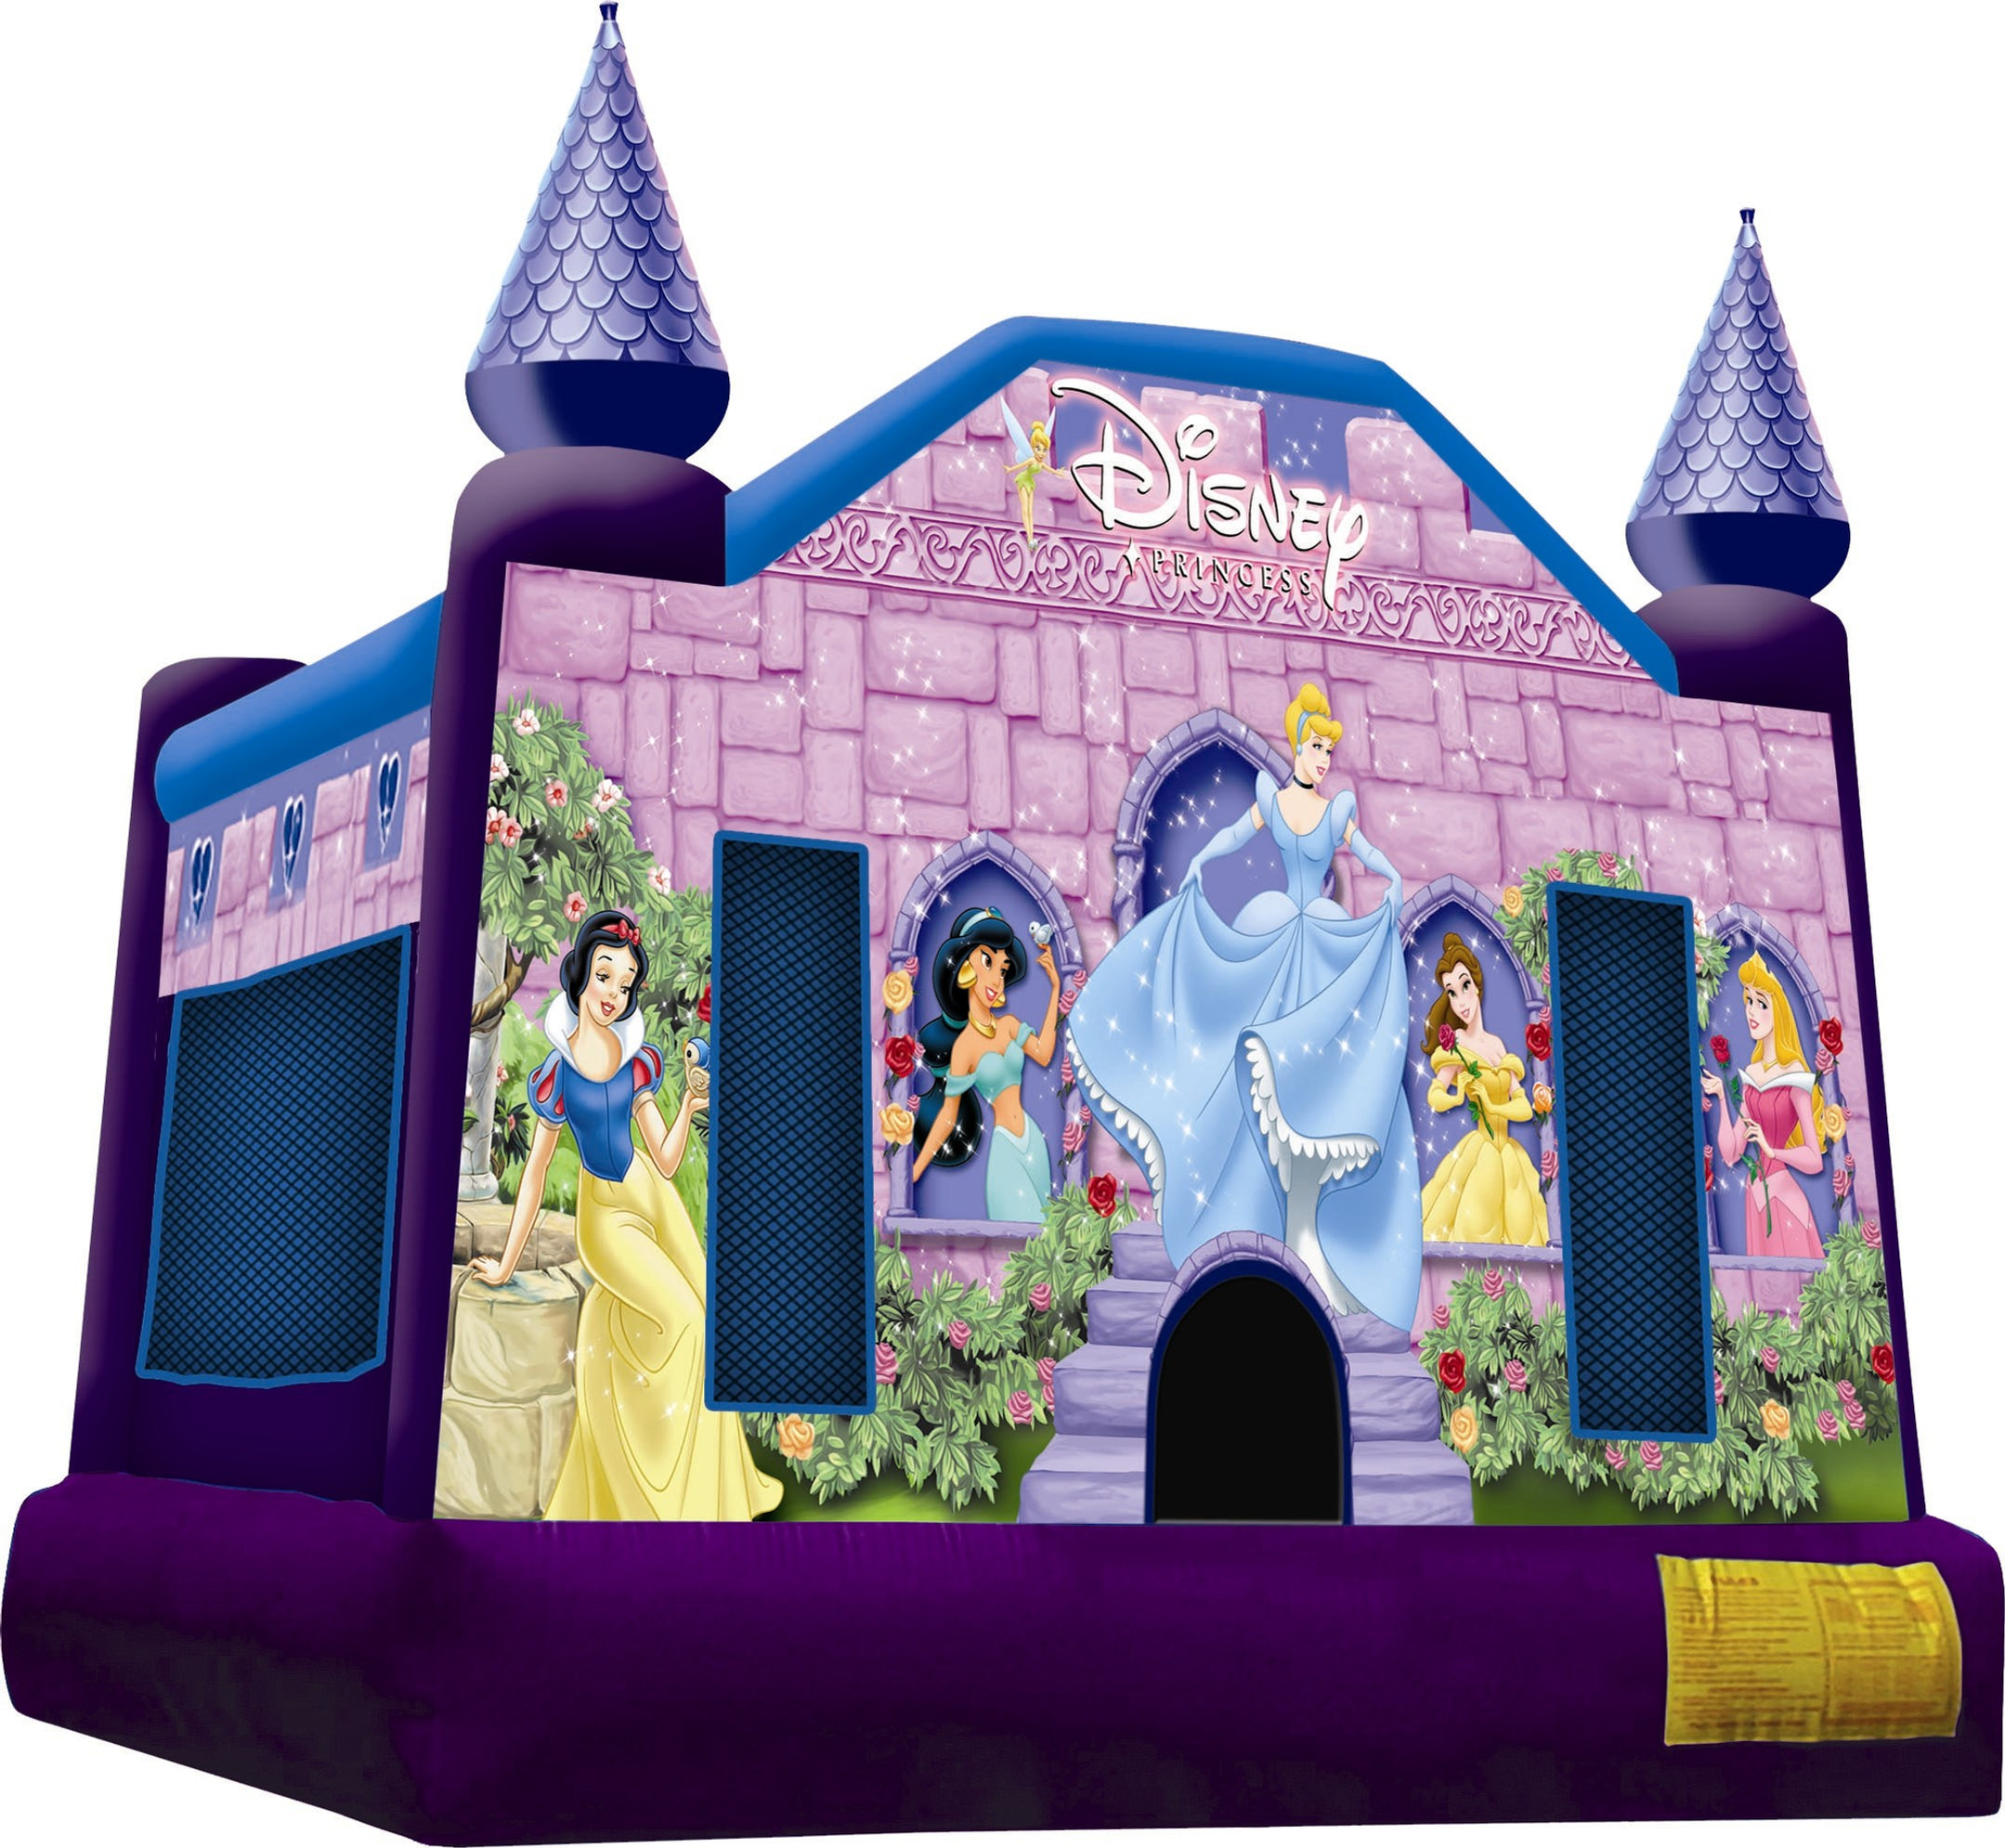 #6 Princess bounce house